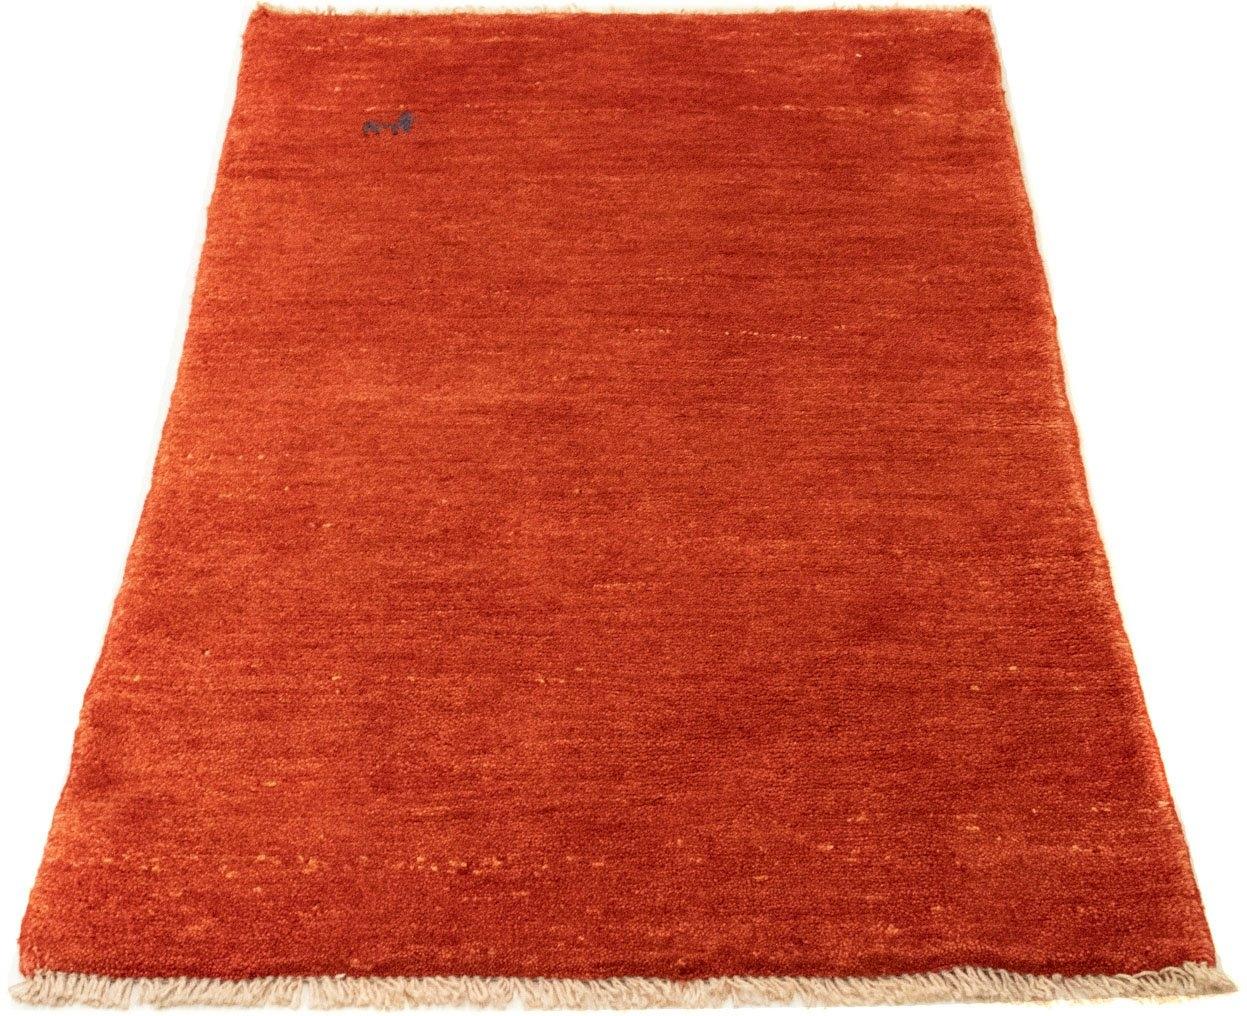 morgenland wollen kleed Gabbeh Teppich handgeknüpft rot handgeknoopt goedkoop op otto.nl kopen